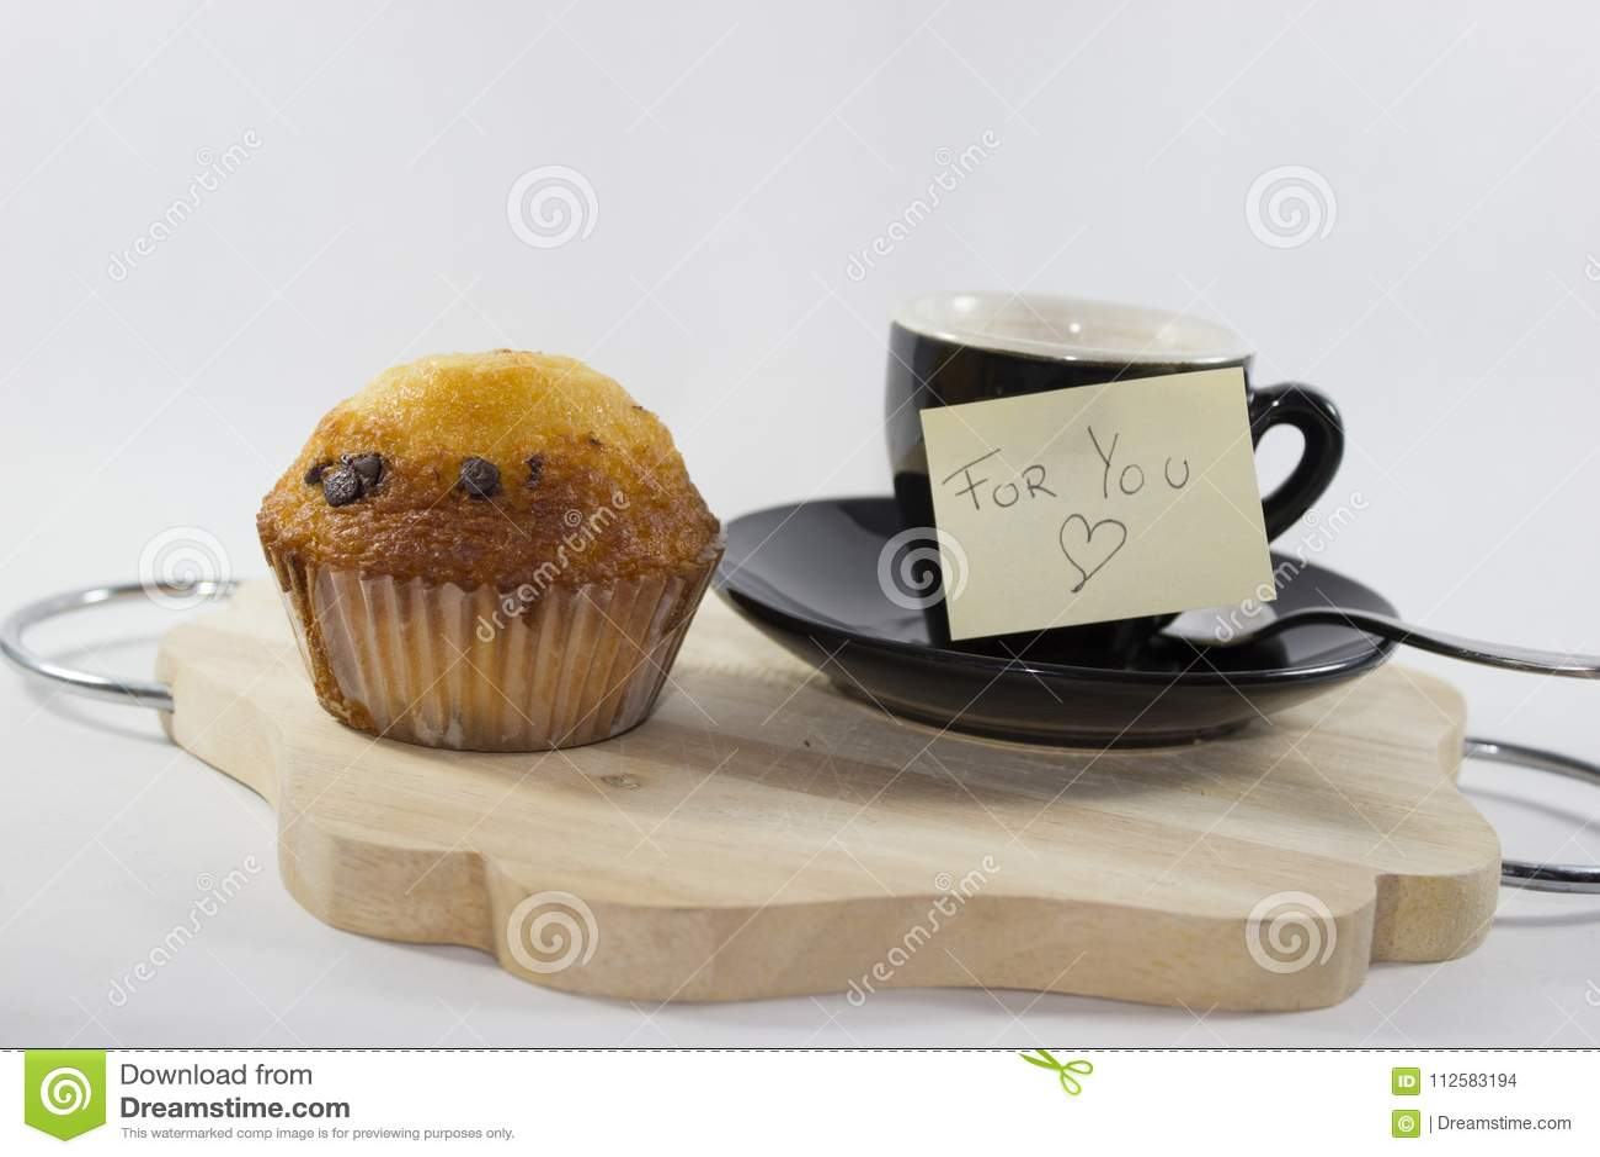 Kaffe på magasinet med muffin med vit bakgrund, med en stolpe